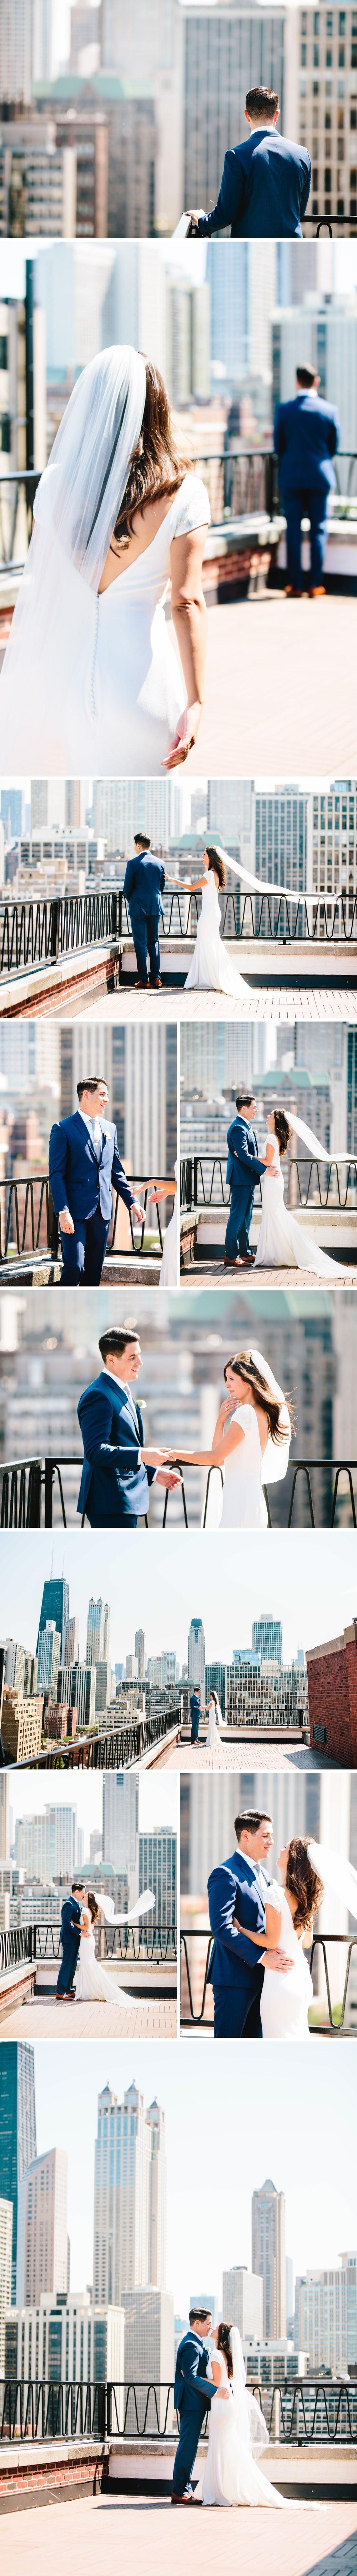 chicago-fine-art-wedding-photography-penninger4